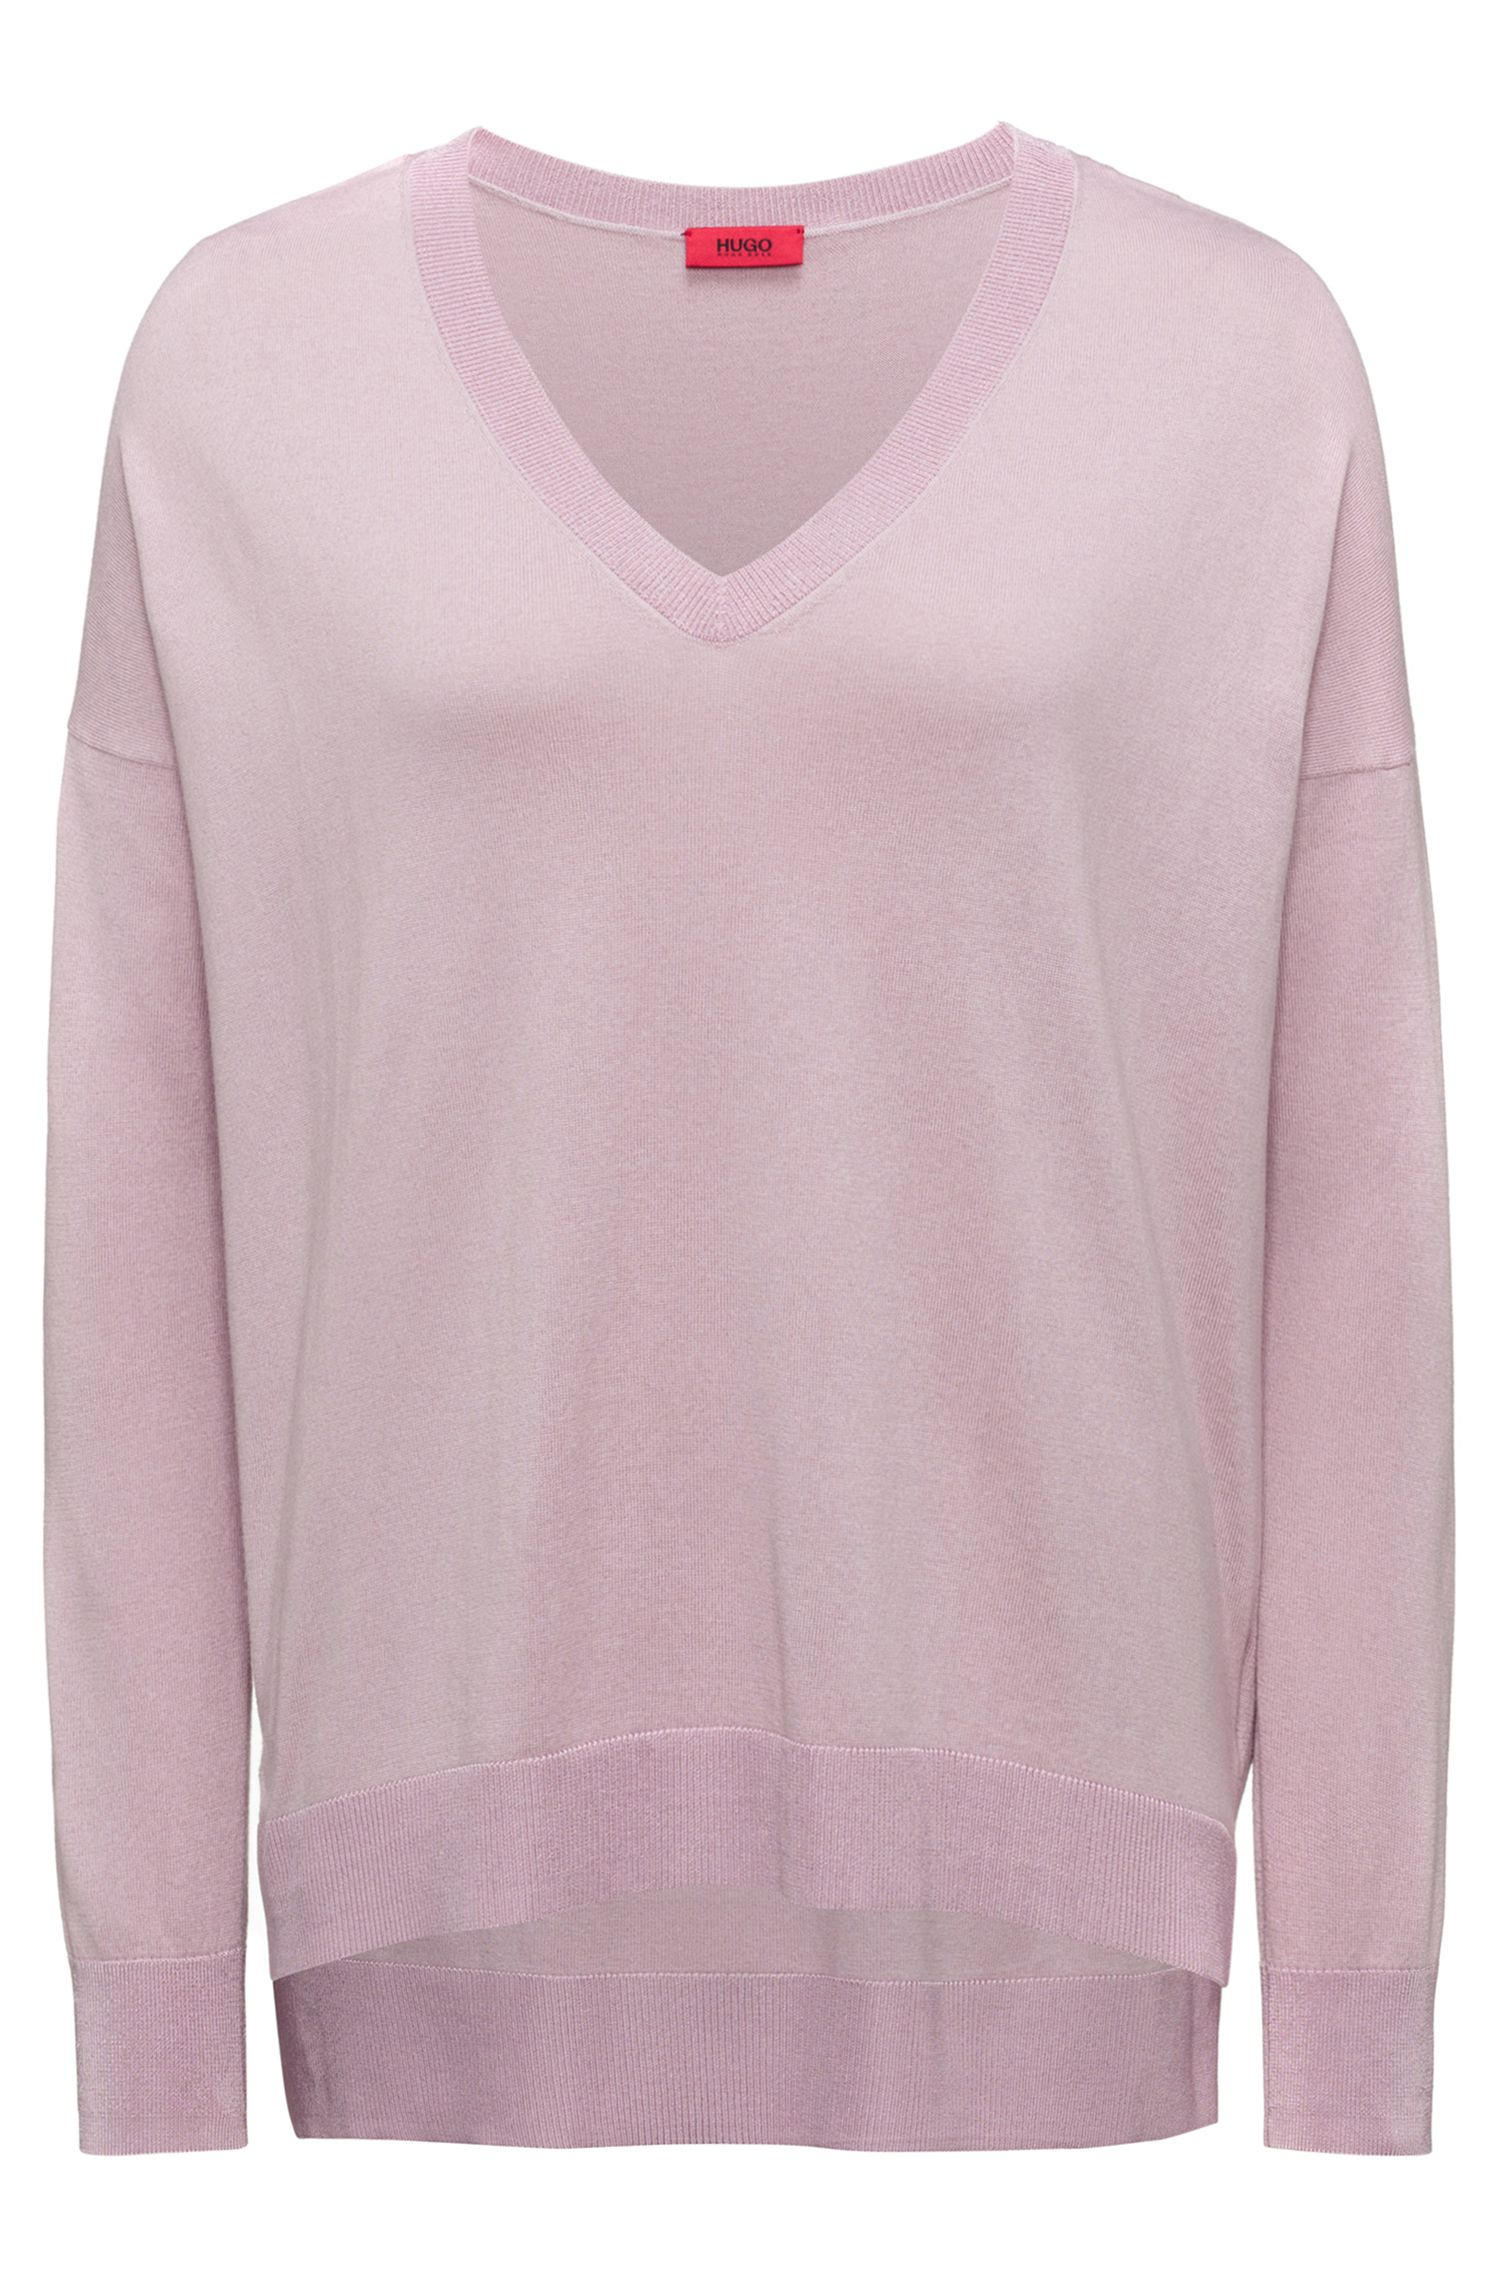 Oversized-fit V-neck sweater in a silk blend, light pink